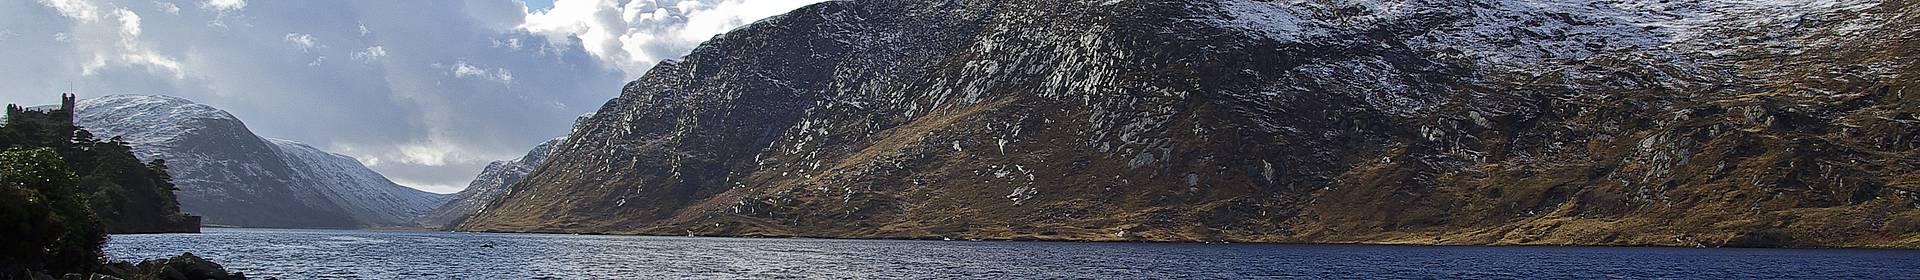 Parc National Glenveagh